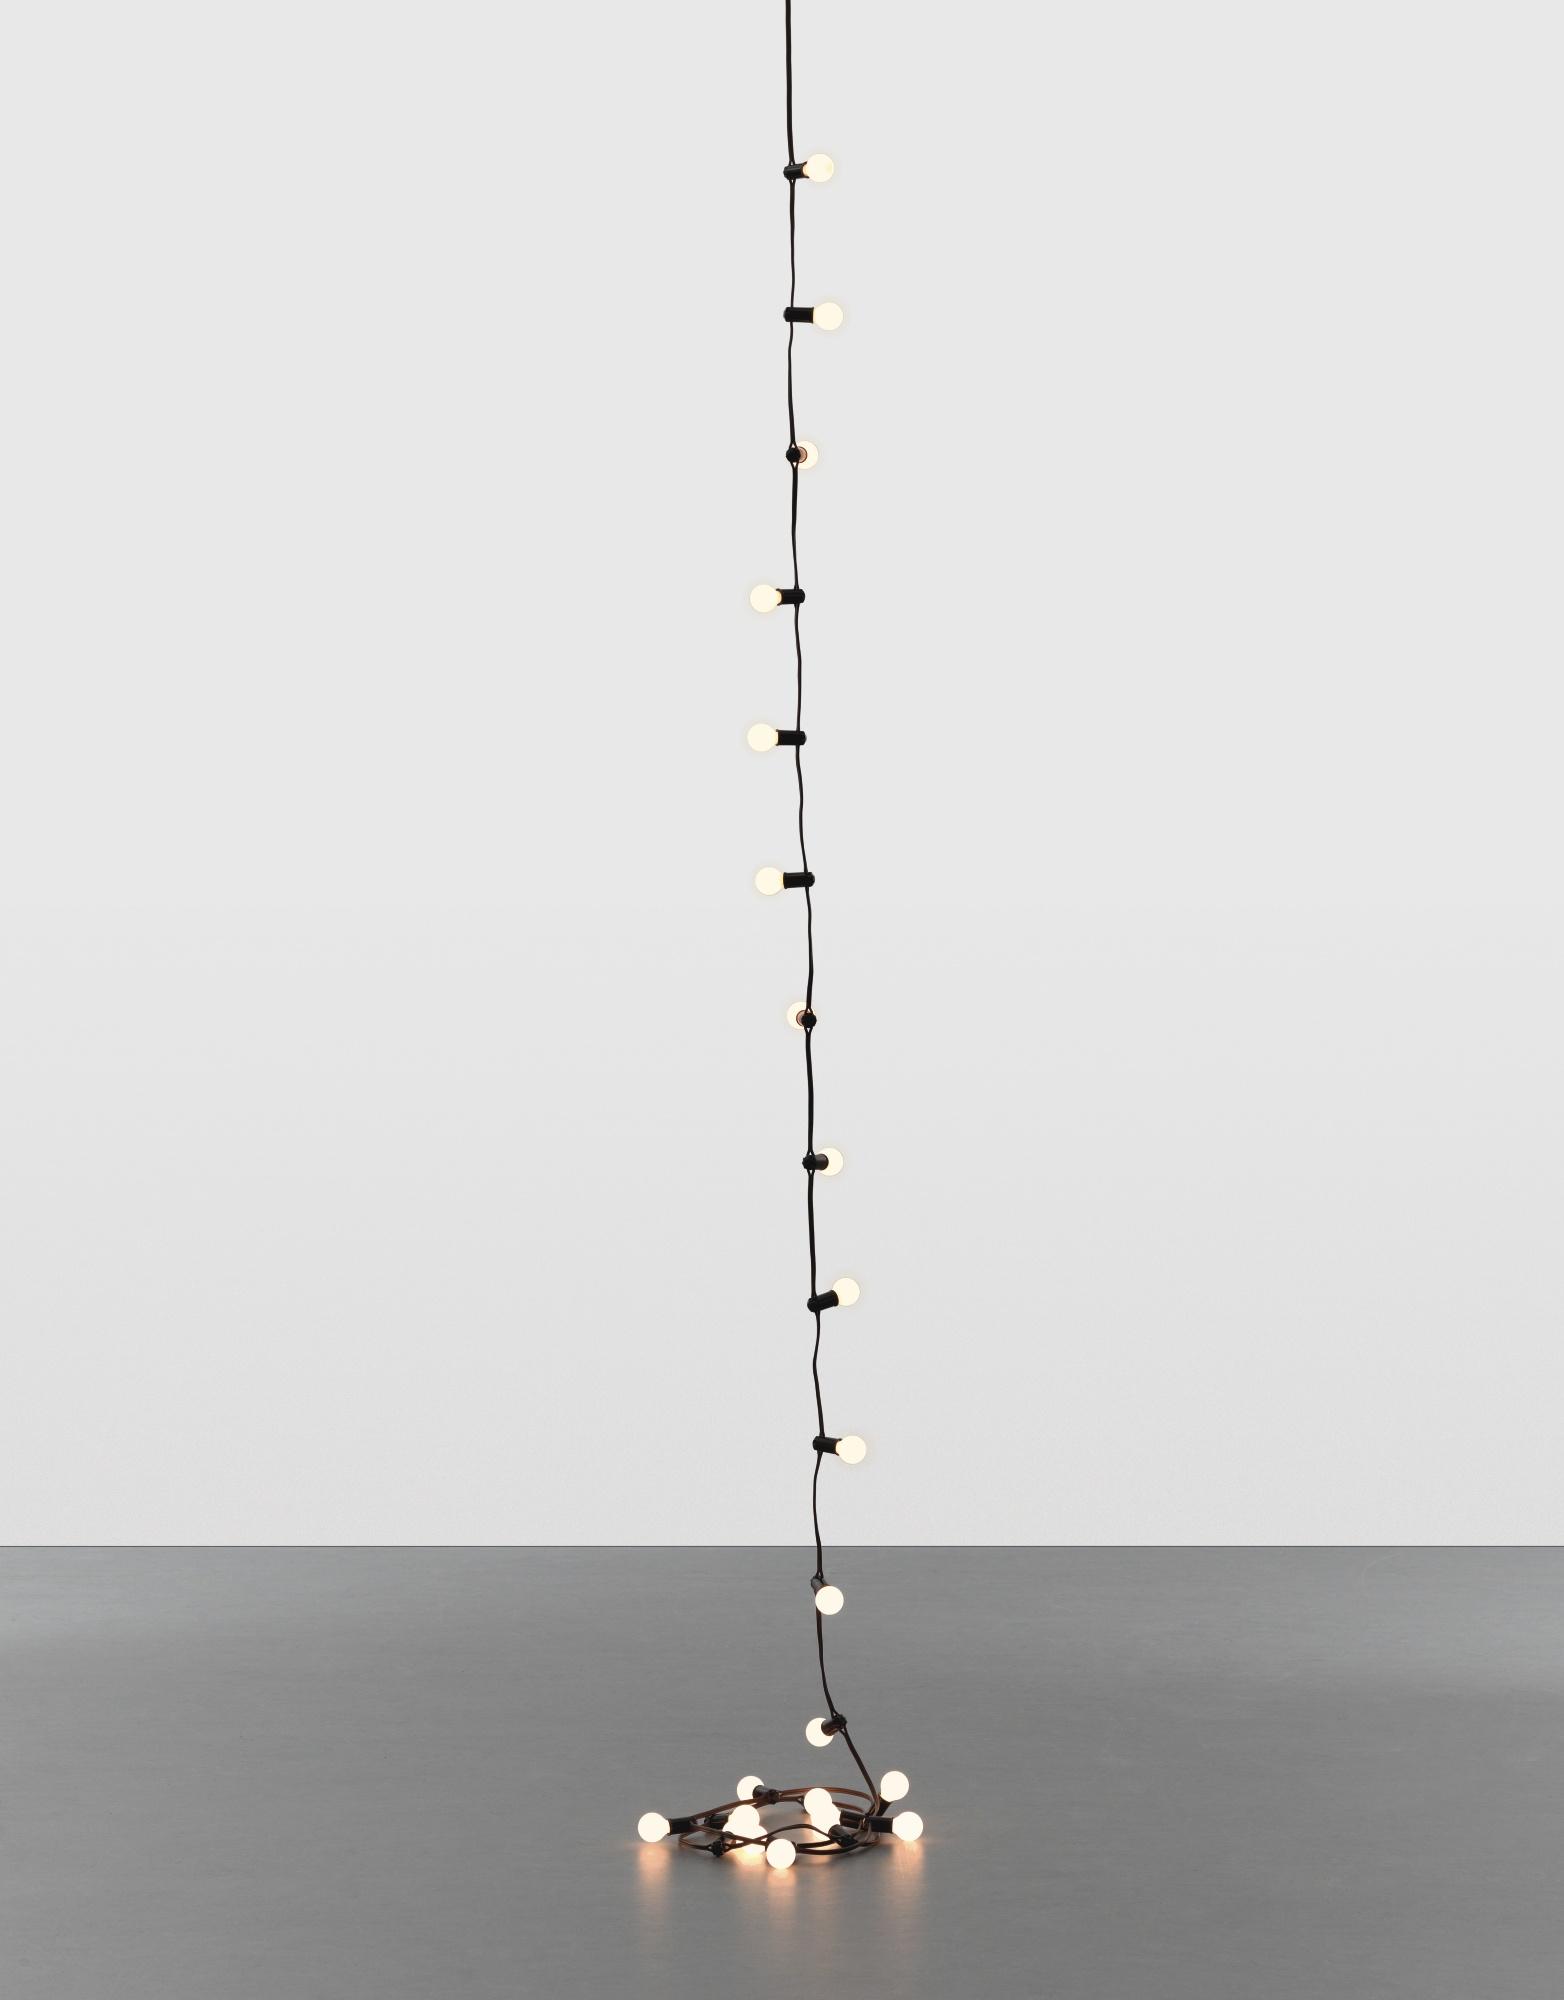 Felix Gonzalez-Torres-Untitled (Last Light)-1993